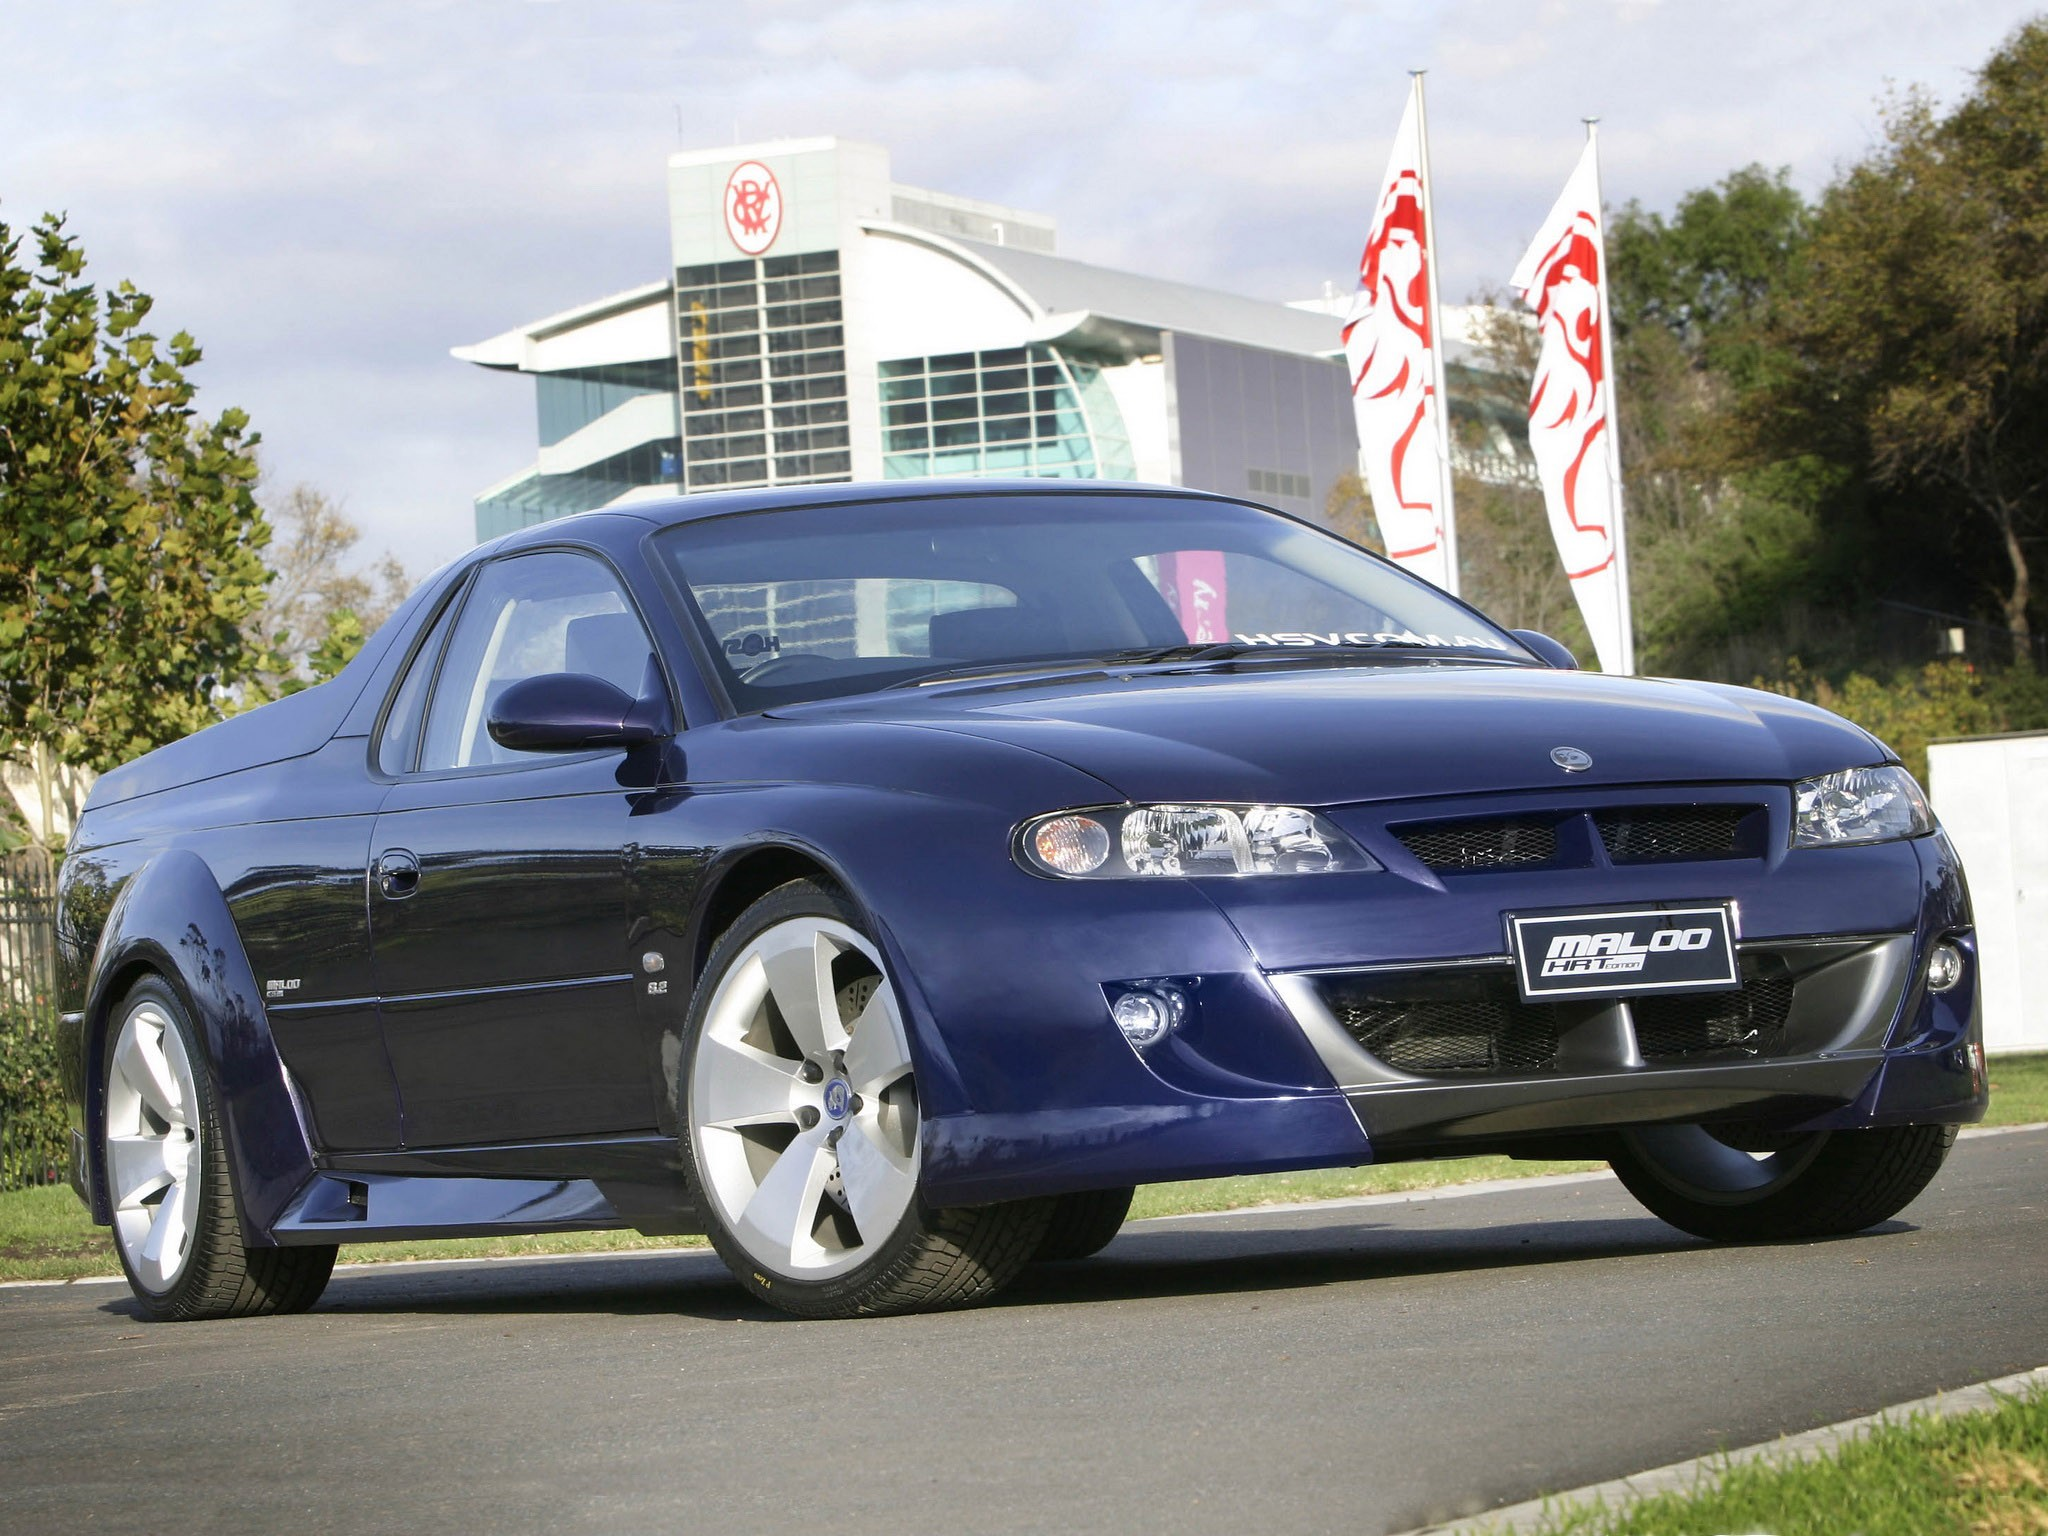 2001 HSV Maloo Concept